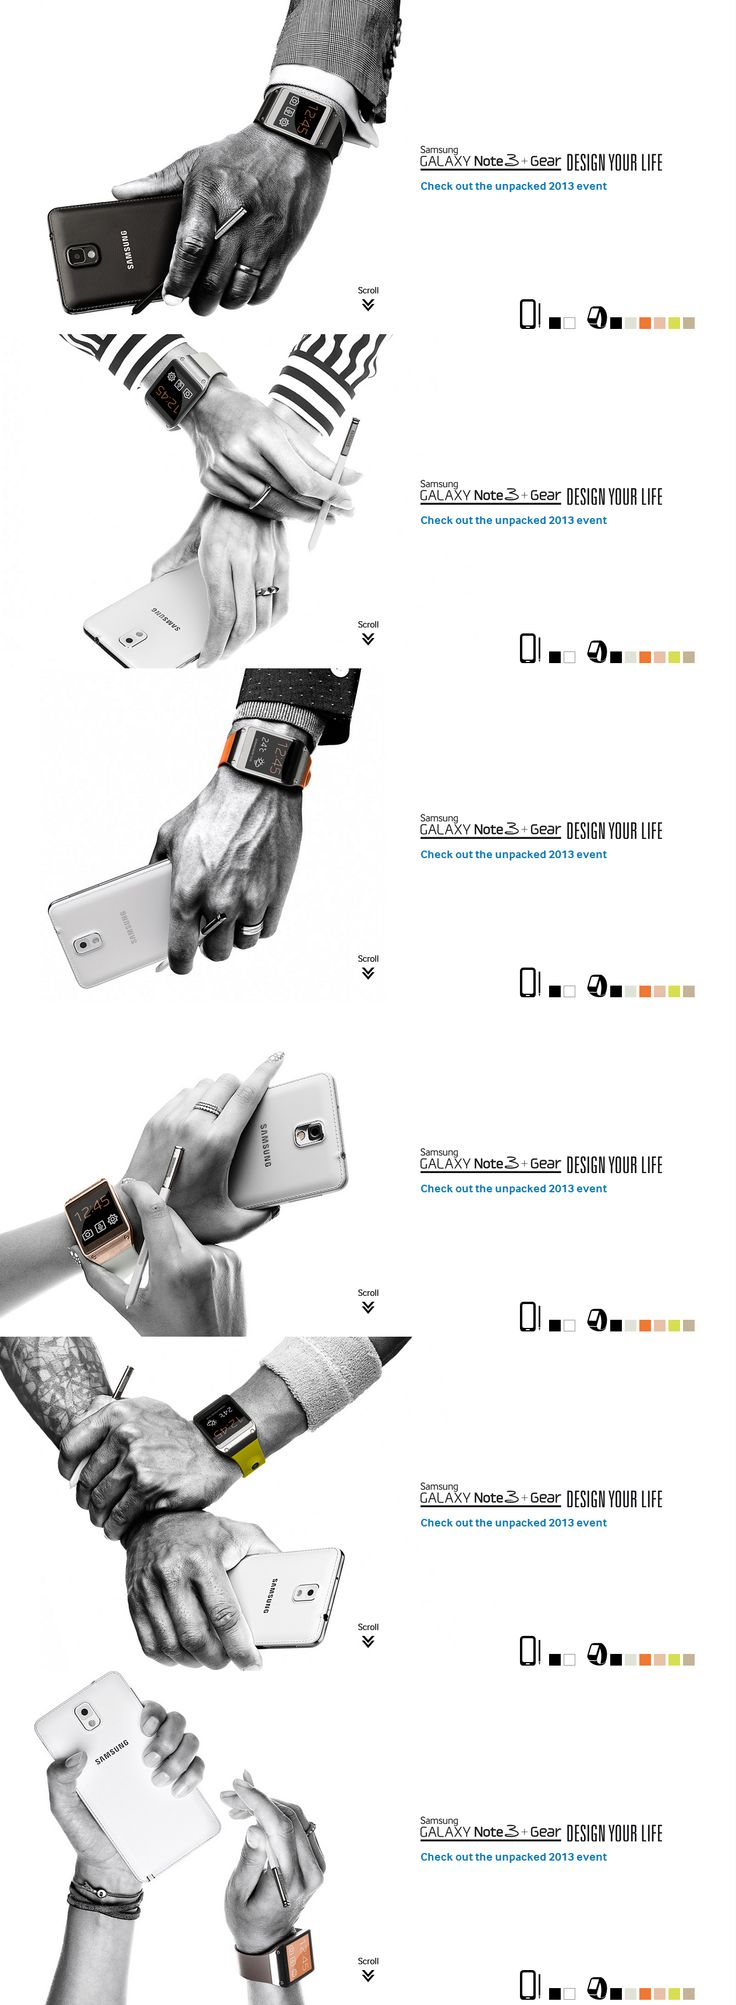 Samsung Galaxy Note3 + Gear Web Site